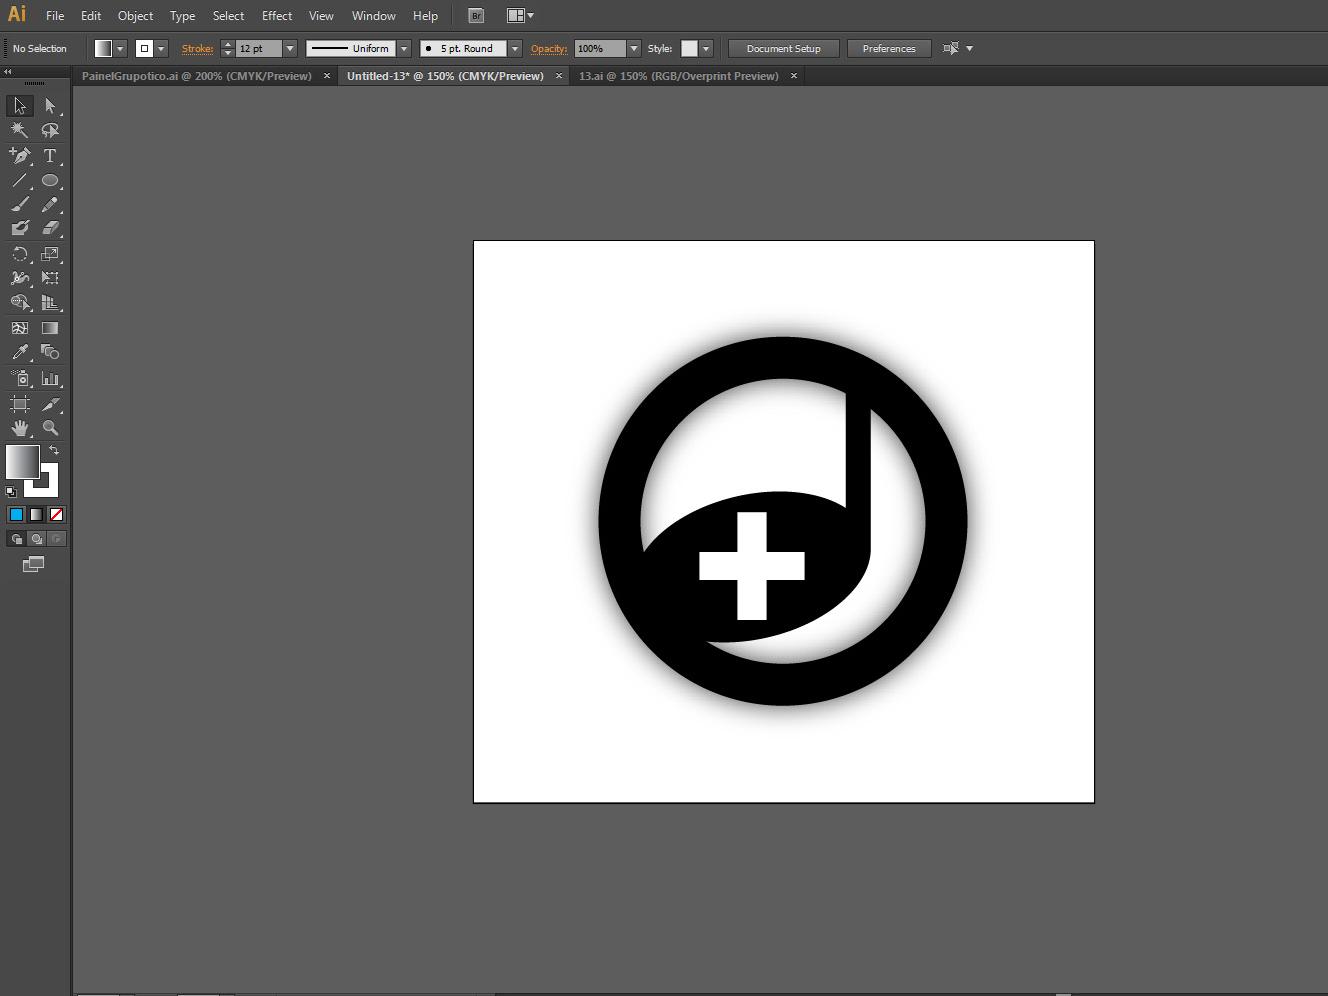 Icon design webdesign icondesign uxdesign uidesign